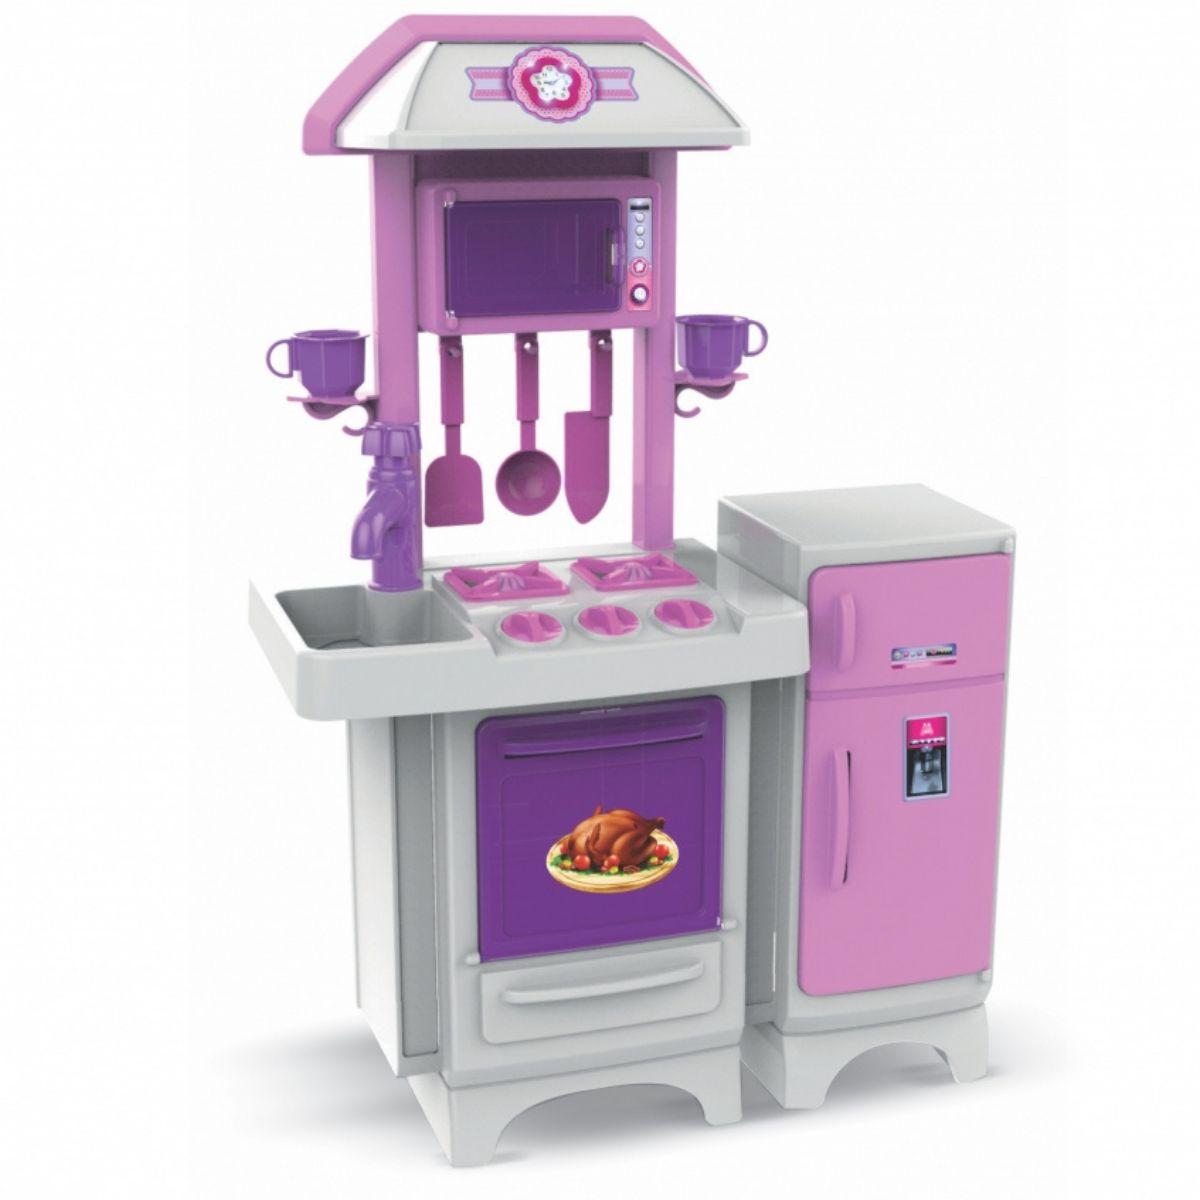 Cozinha Completa Sem água Rosa Magic